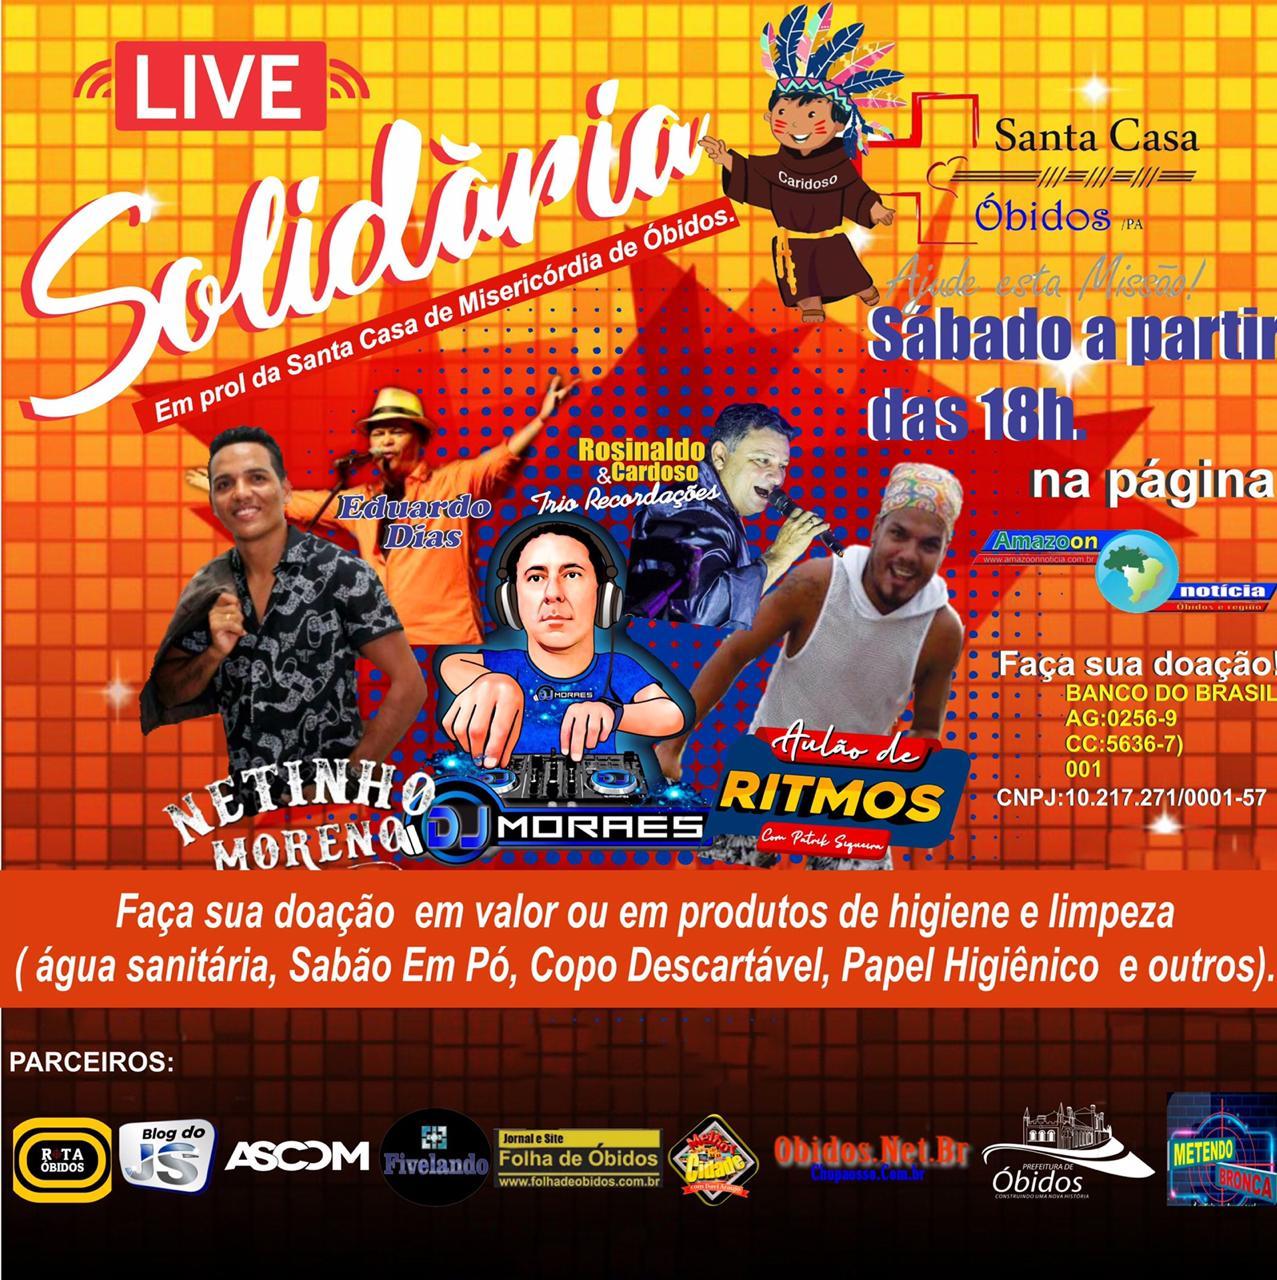 Live Solidária neste sábado (09) visa arrecadar produtos de limpeza e higiene para Santa Casa de Misericórdia de Óbidos.